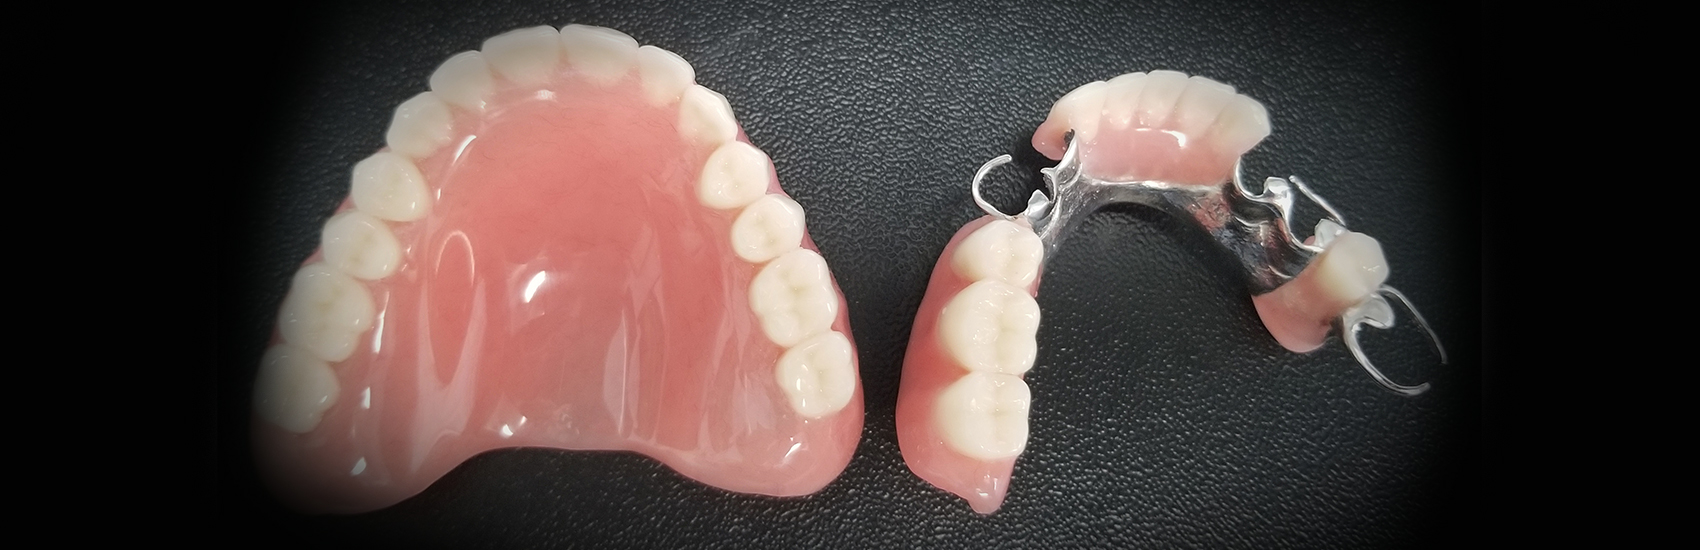 Dentures_2020